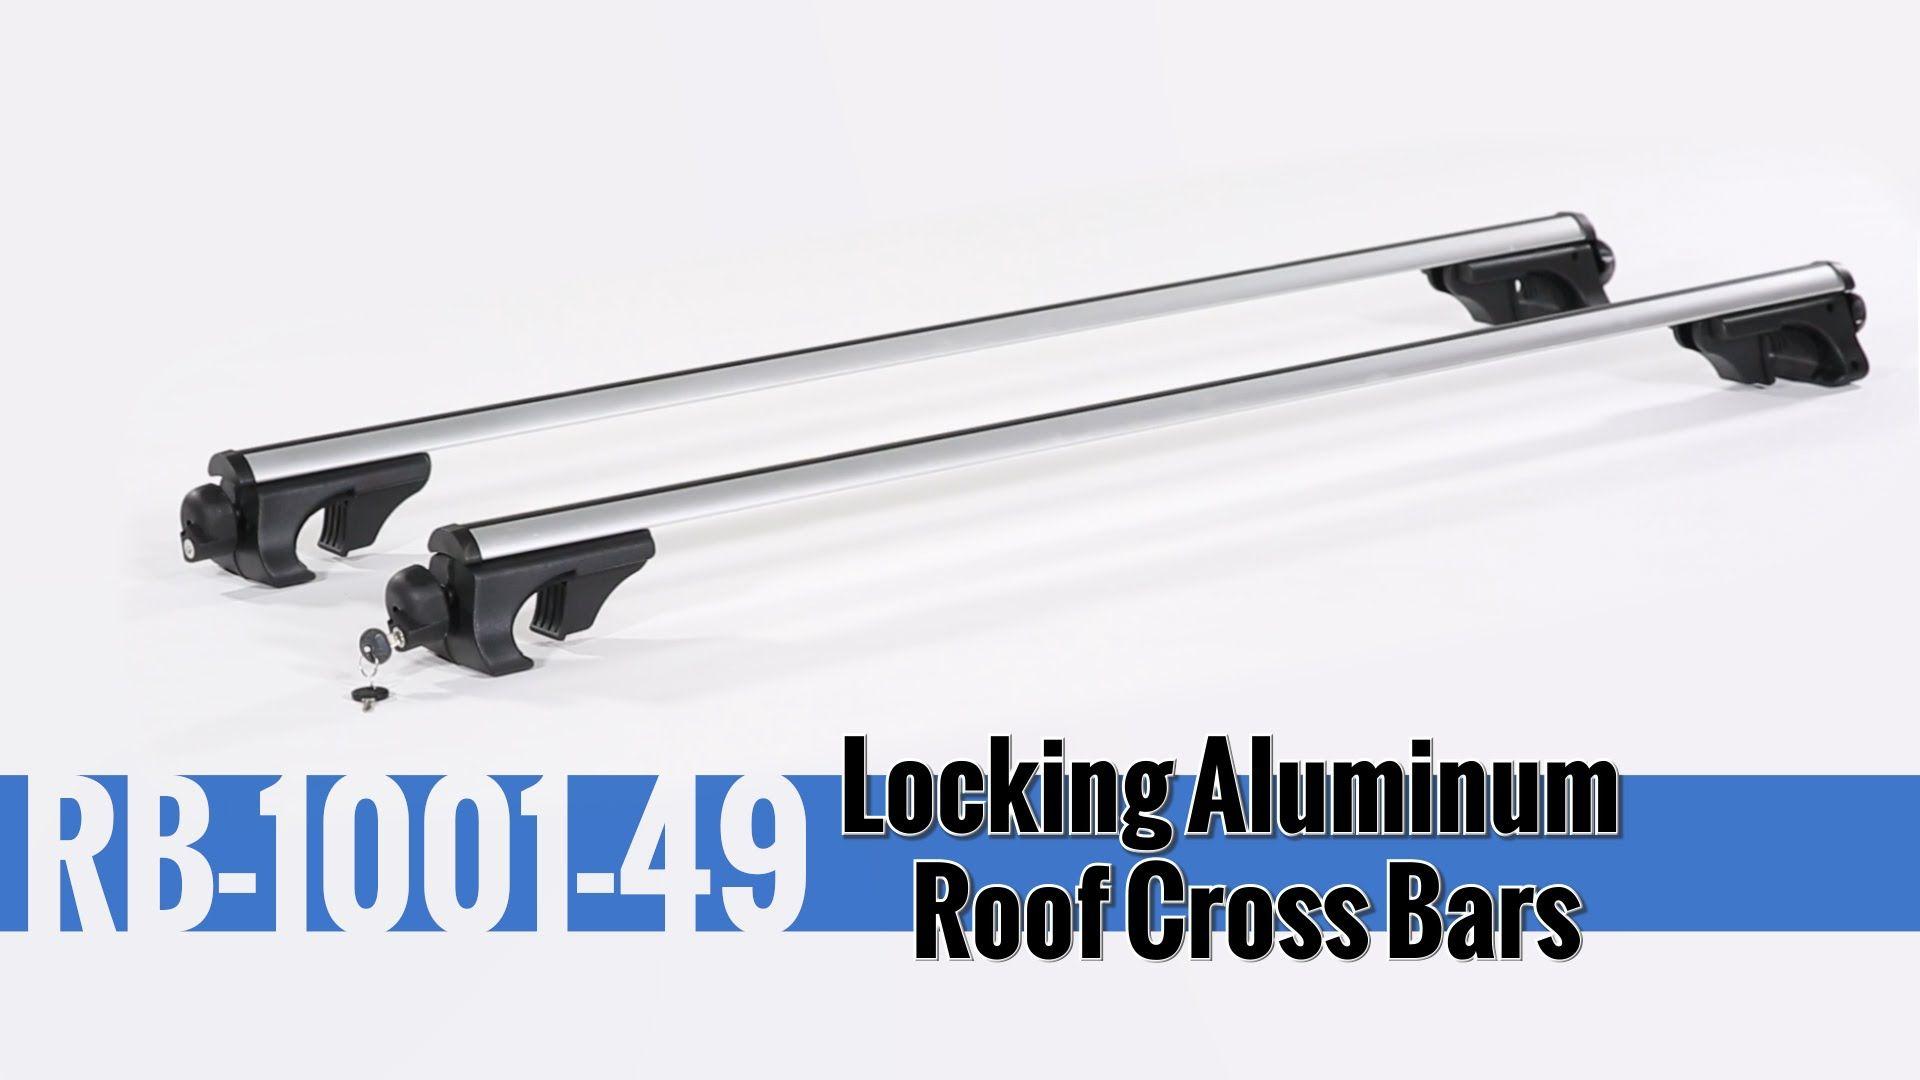 Locking Aluminum Roof Cross Bars Installation and Use